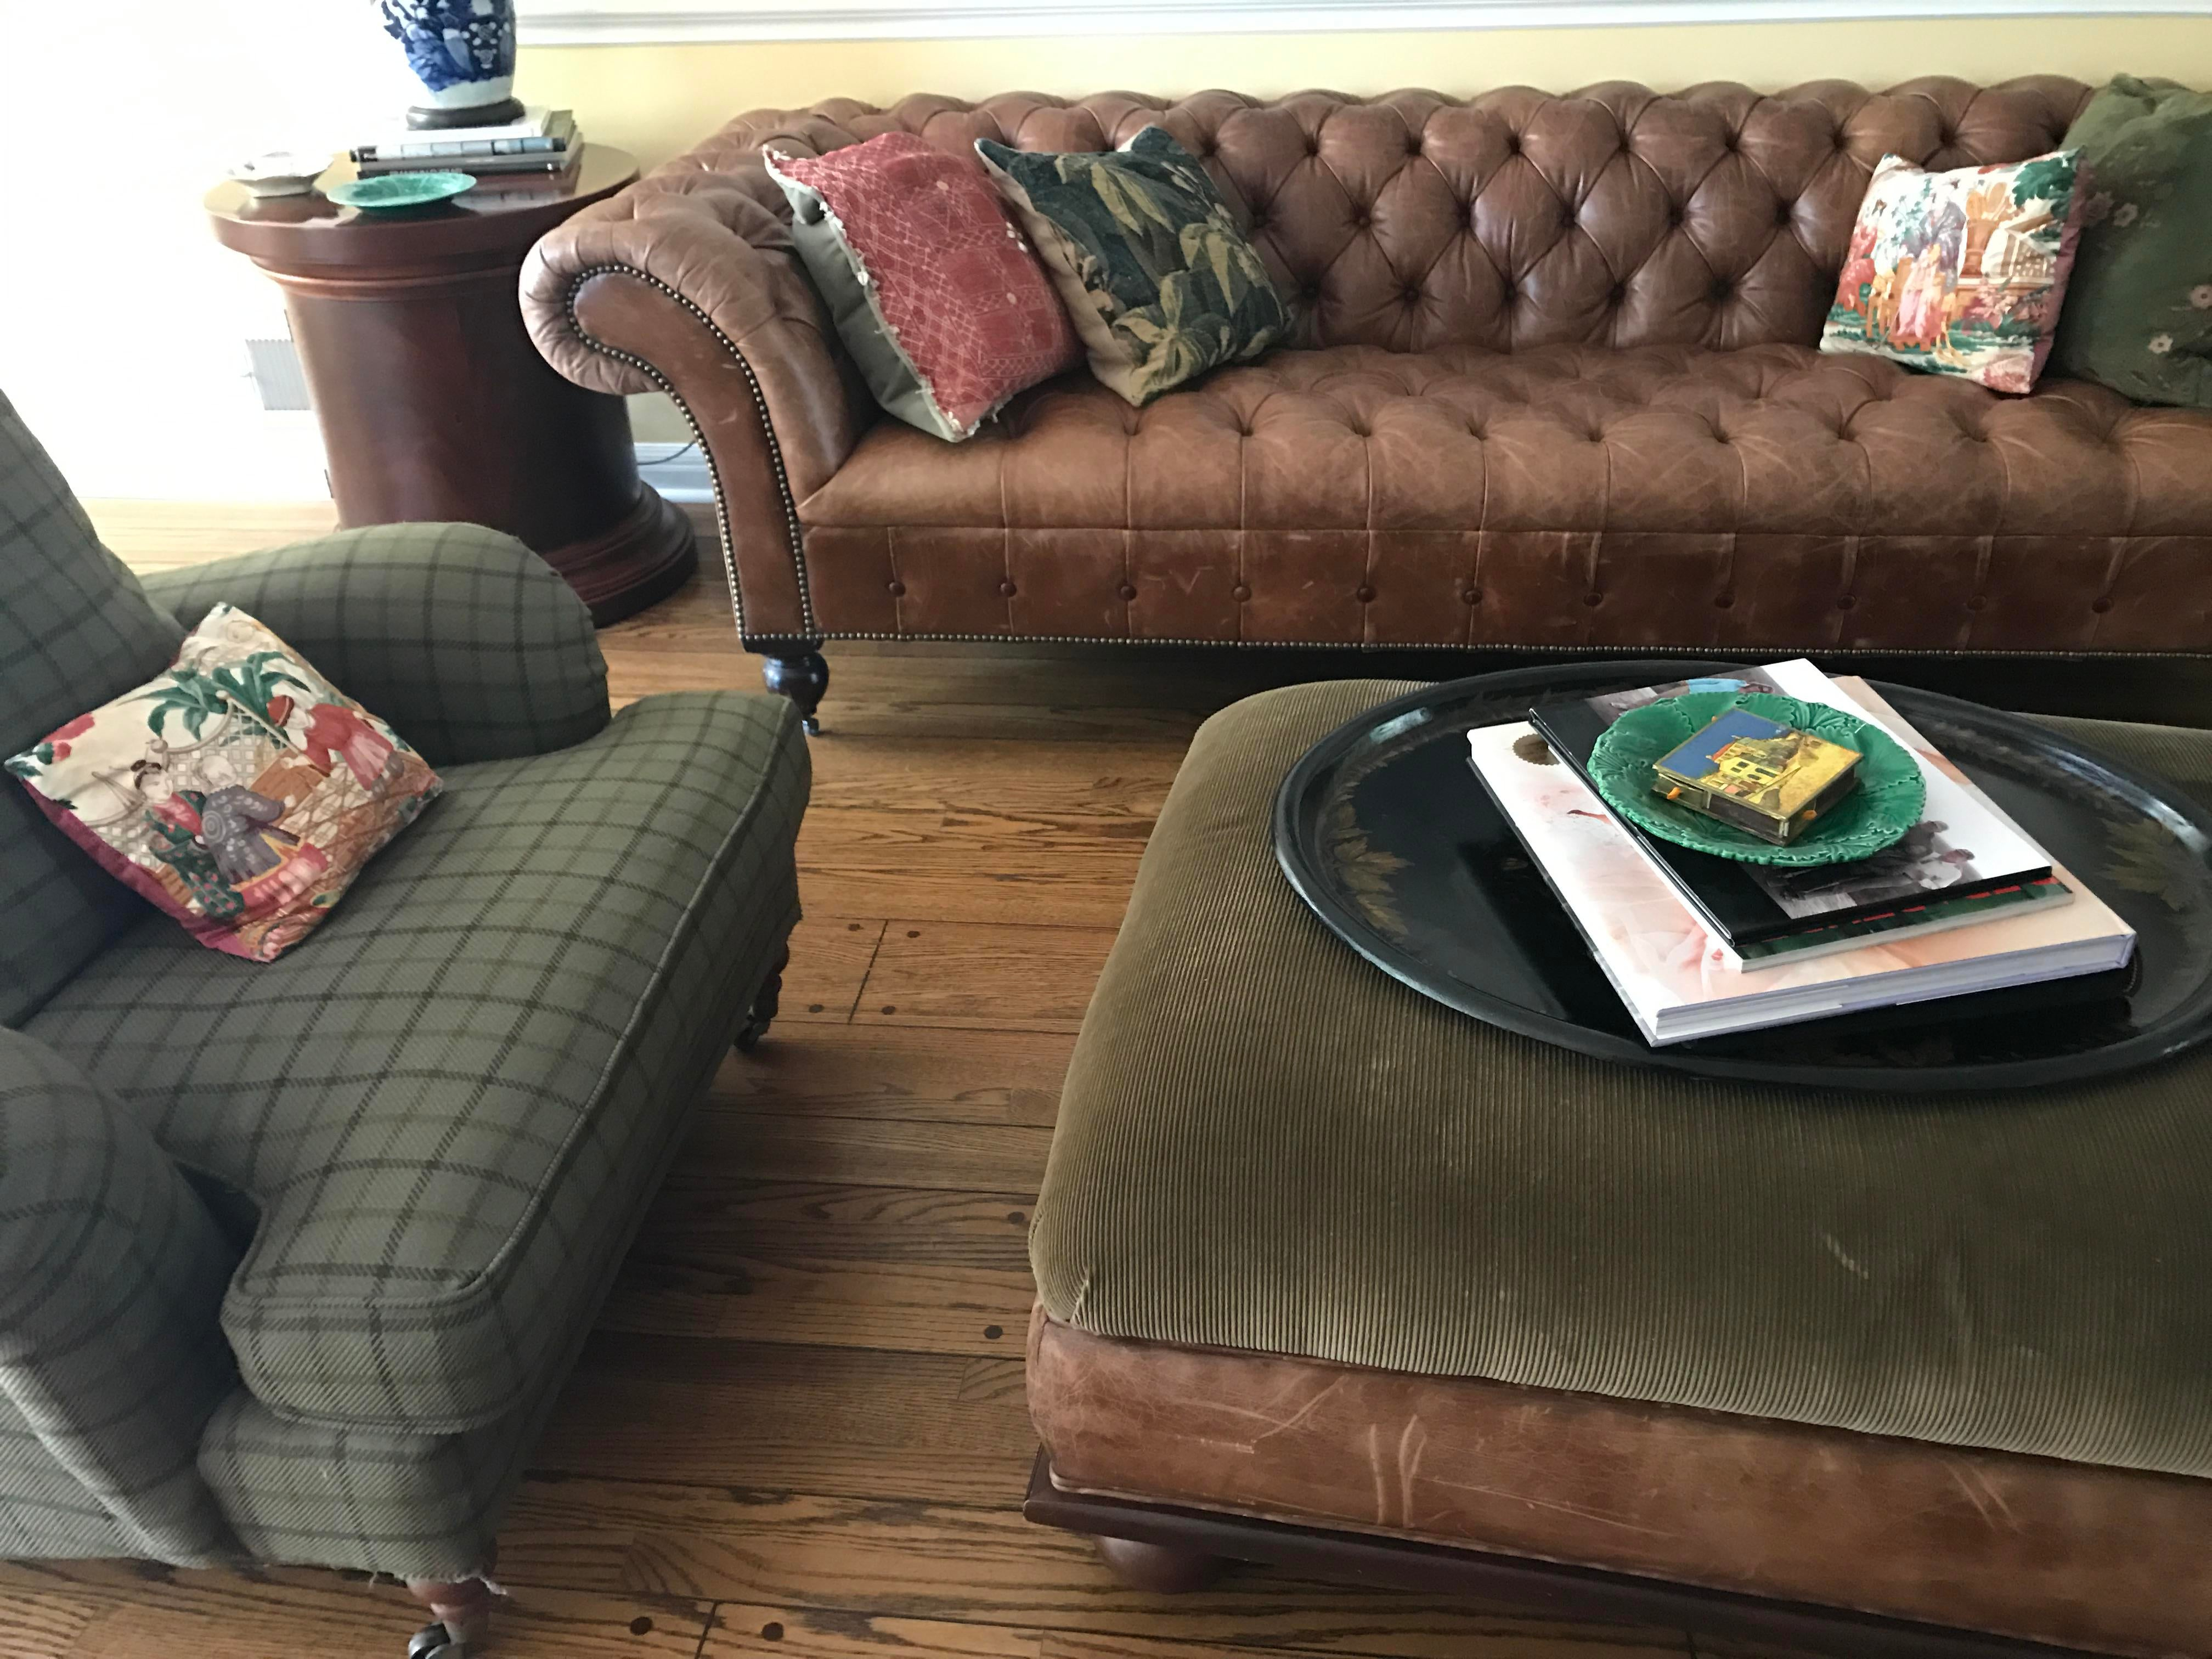 ralph lauren home chesterfield sofa friheten 3 seater bed review brown leather | chairish